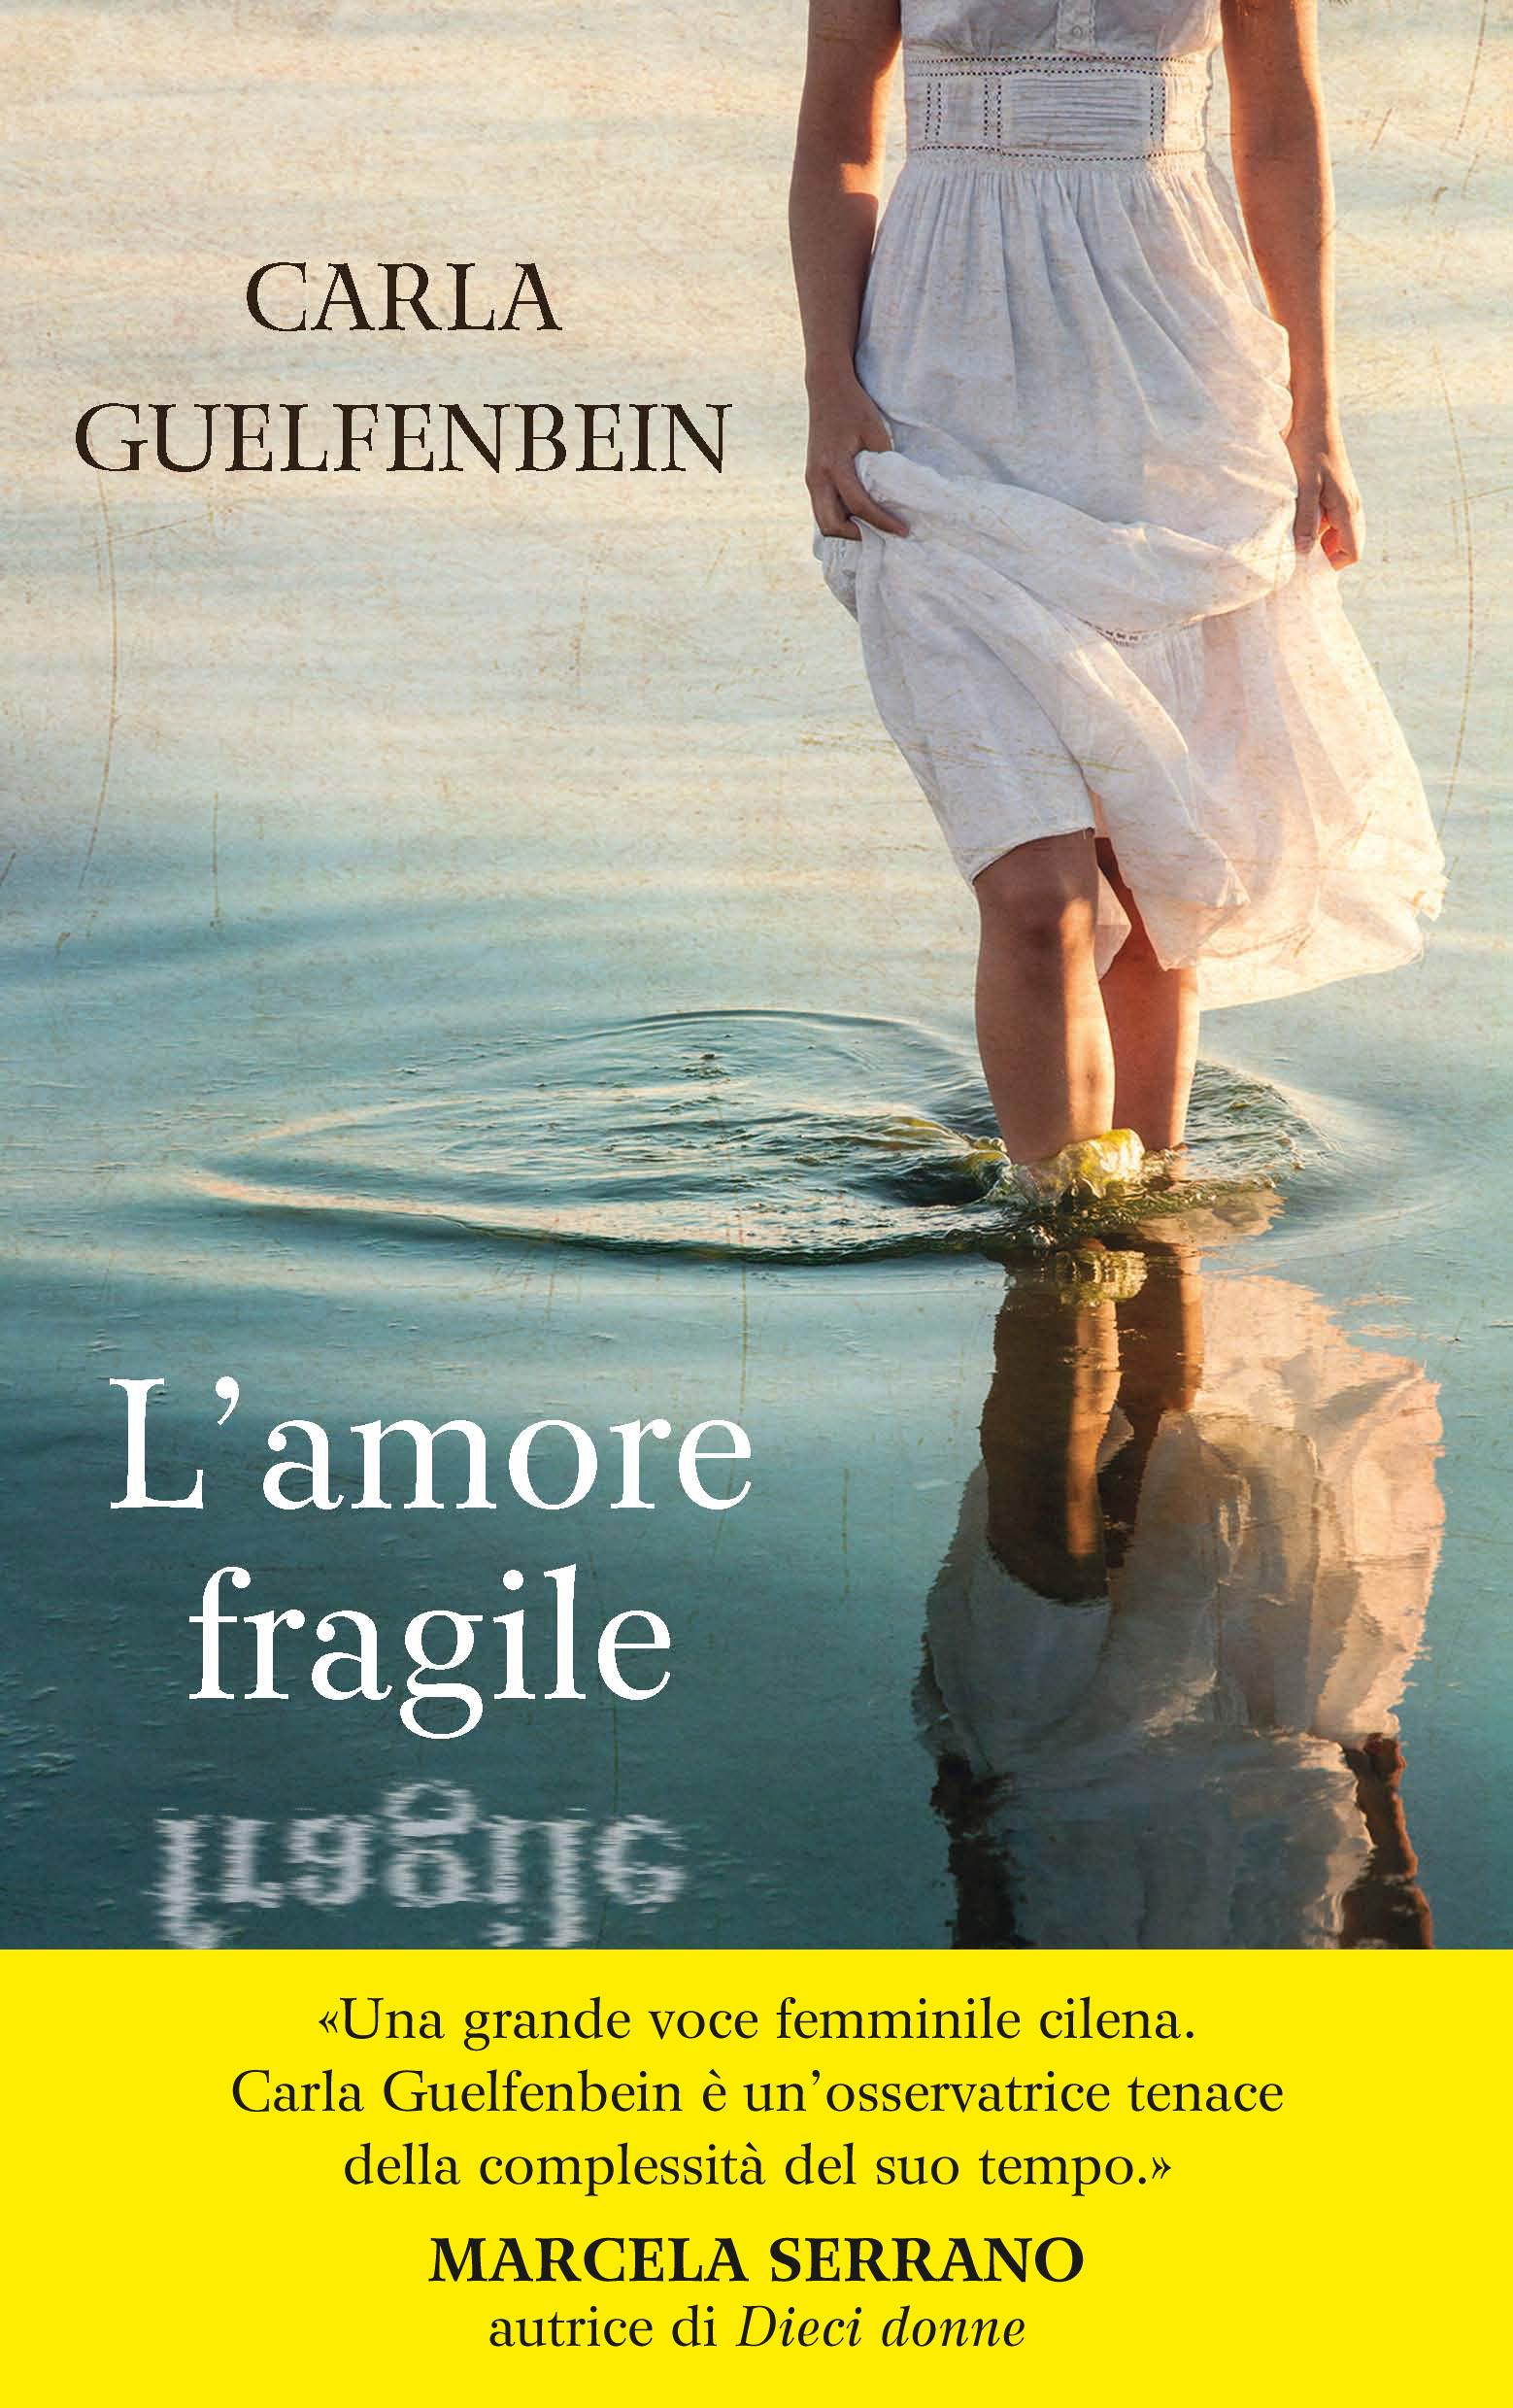 l'amore fragile recensione